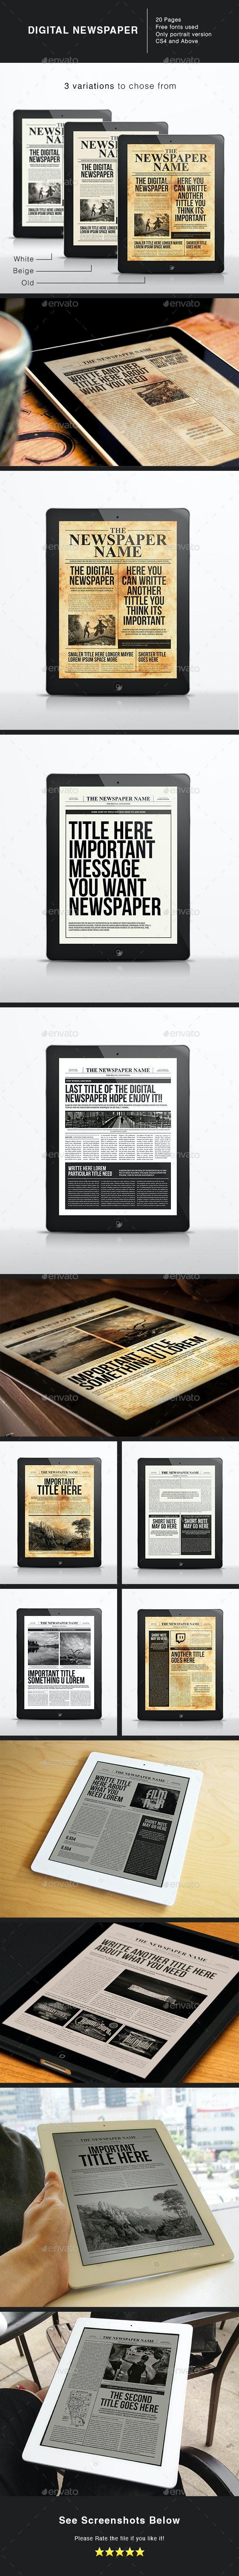 The Digital Newspaper - Digital Magazines ePublishing